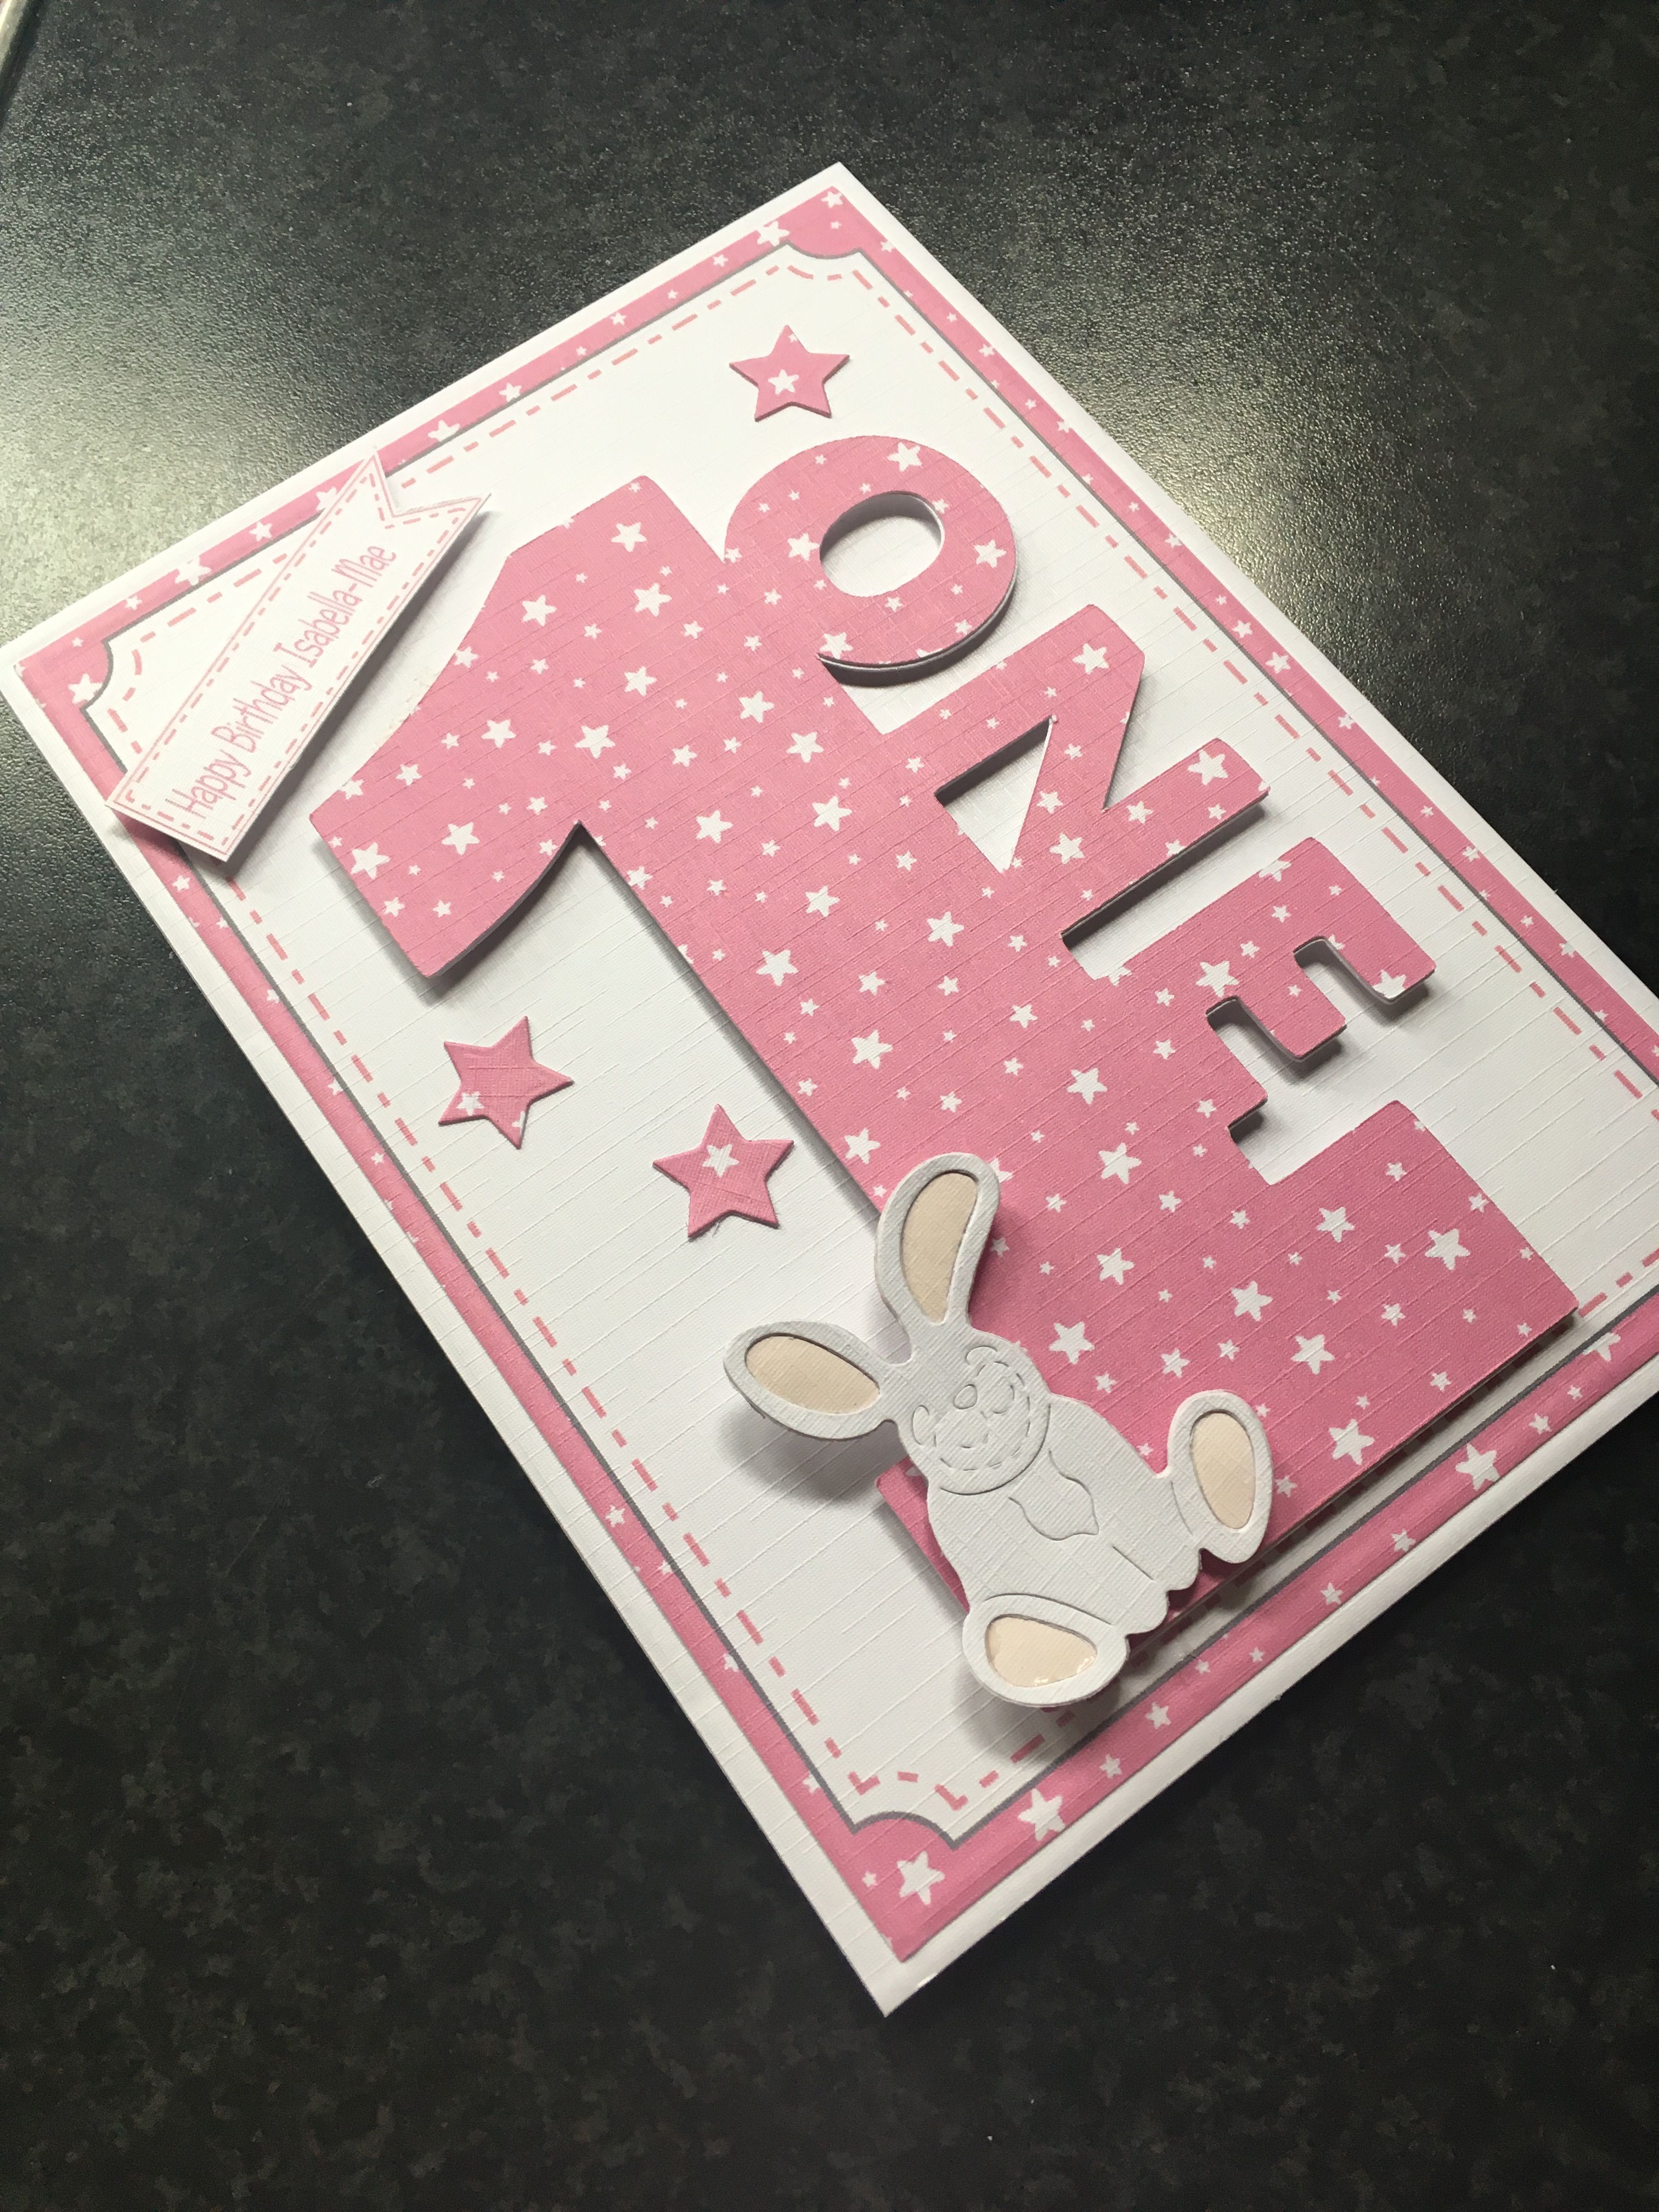 Handmade 1st Birthday Card For Baby Girl Baby Cards Handmade Handmade Birthday Cards Girl Birthday Cards